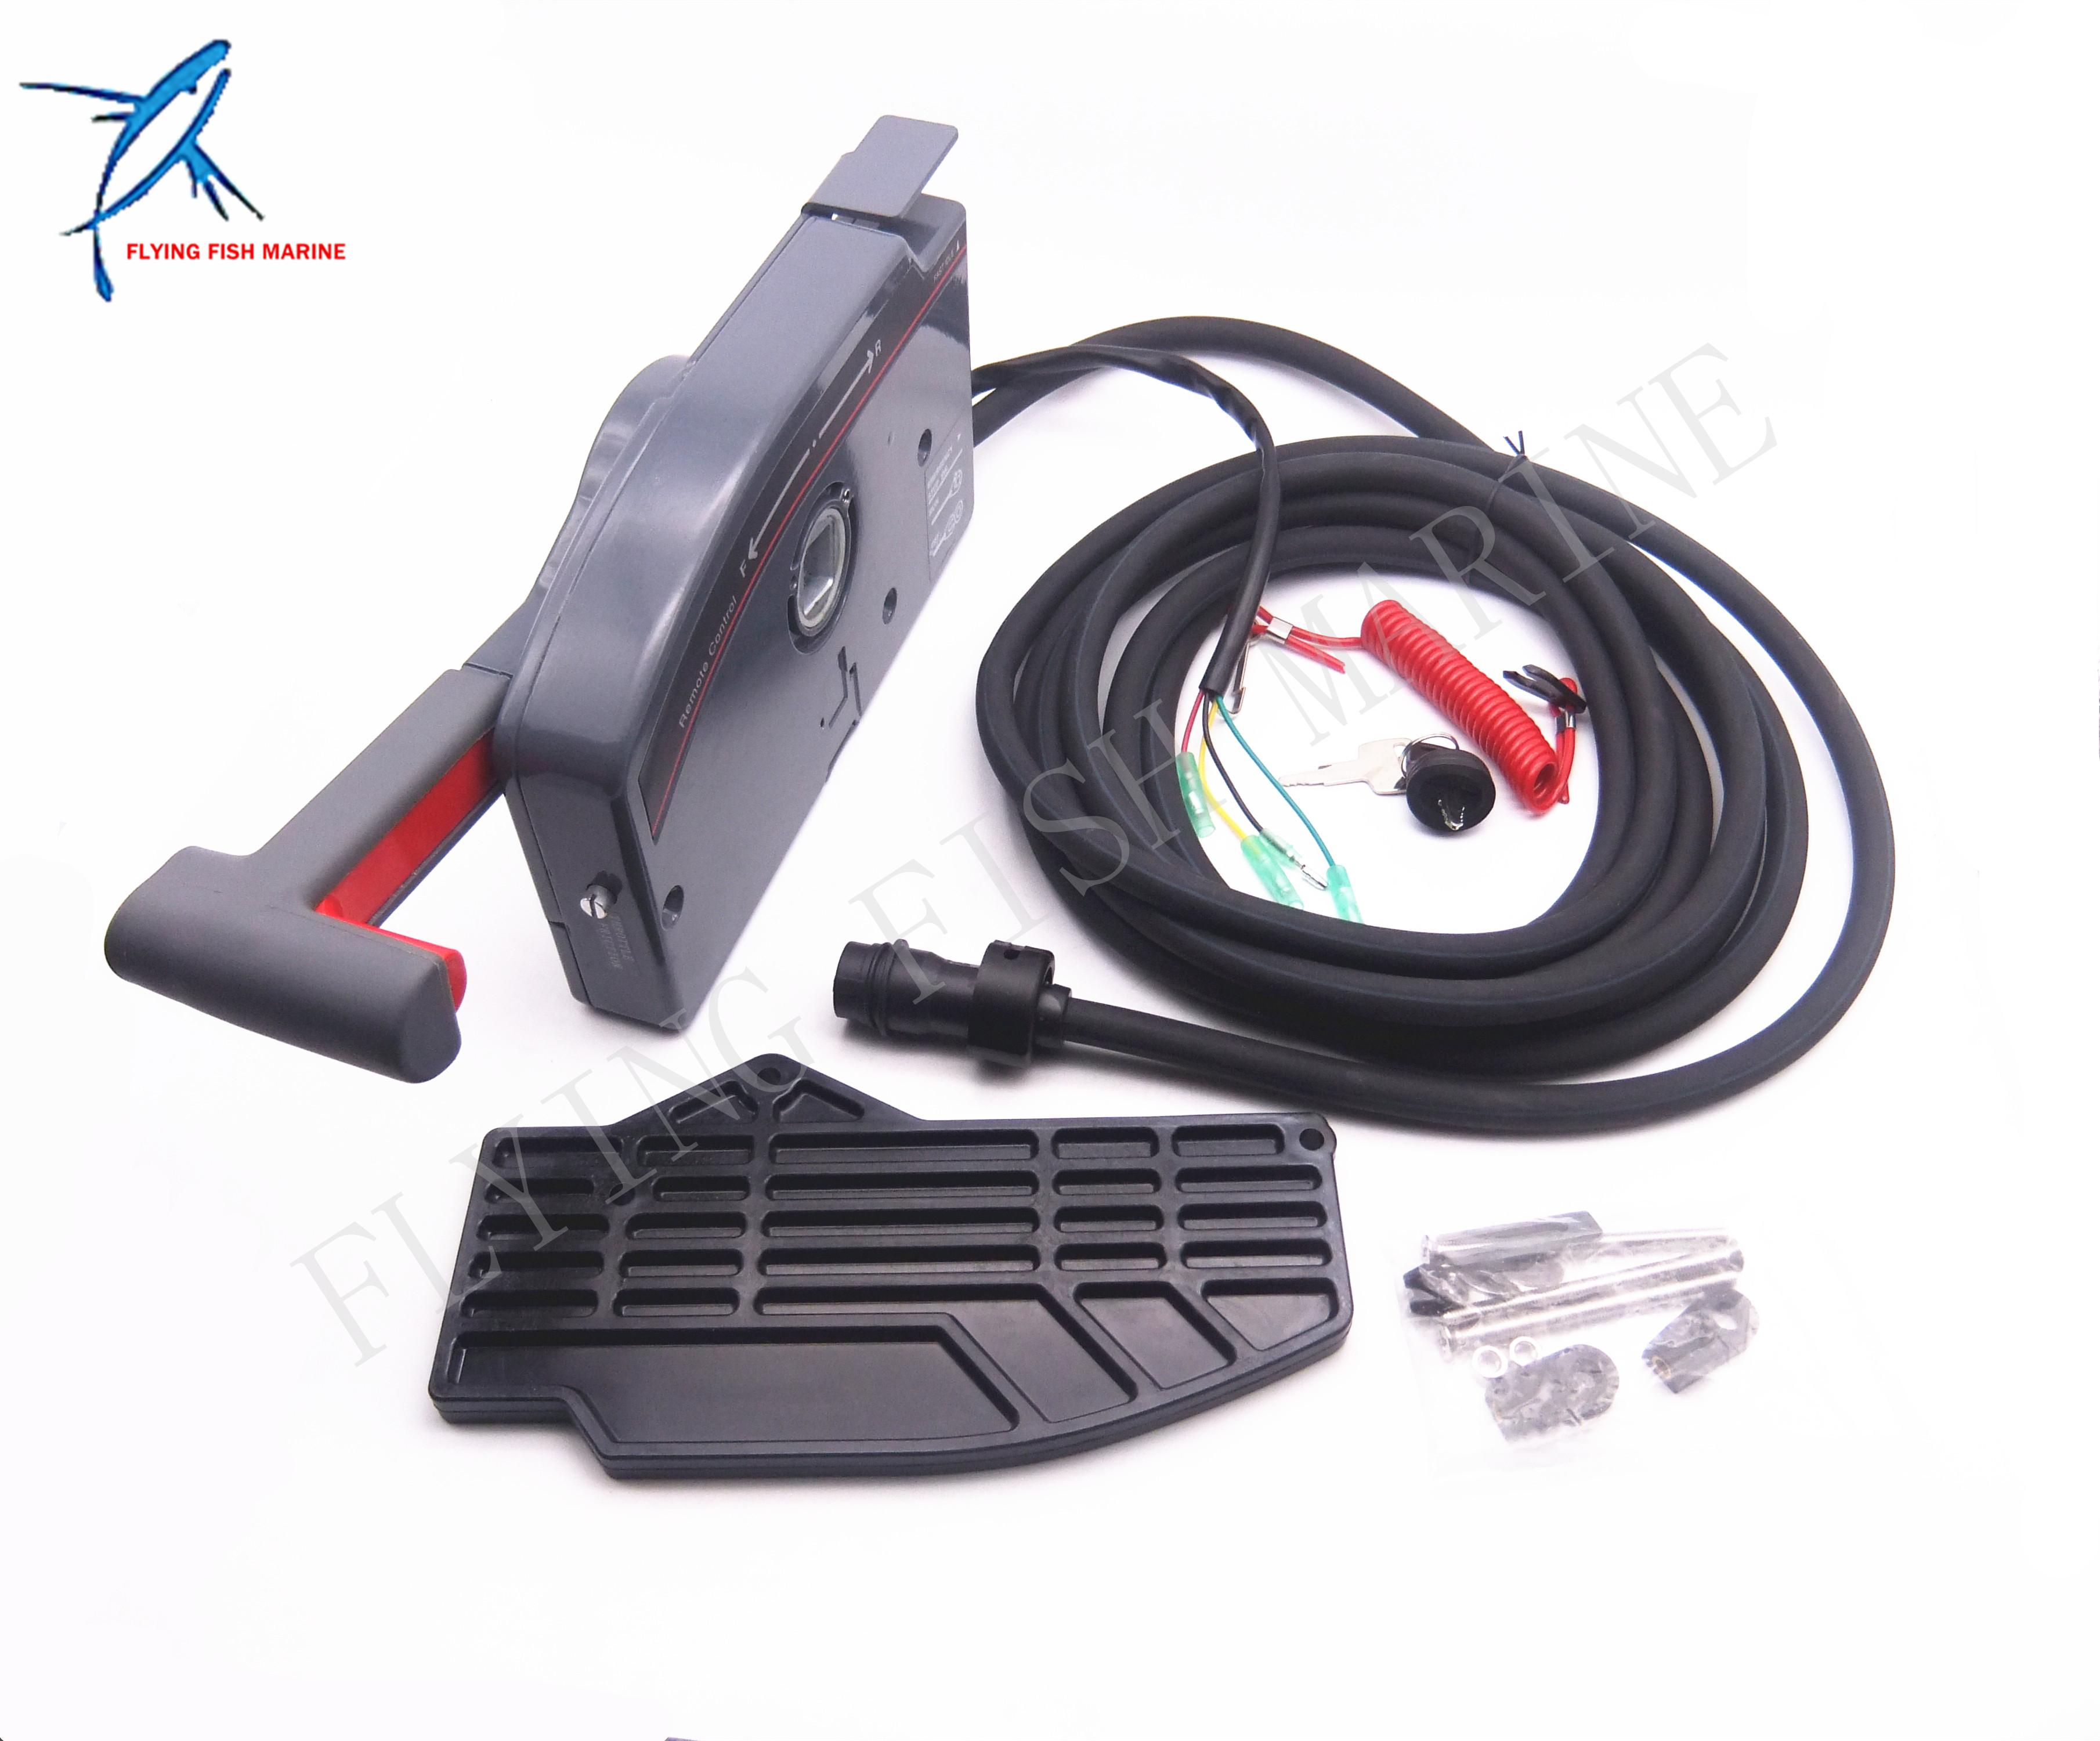 yamaha 703 controller wiring harness boat motor control box assy 703-48205-16-00 703-48207 ... #11